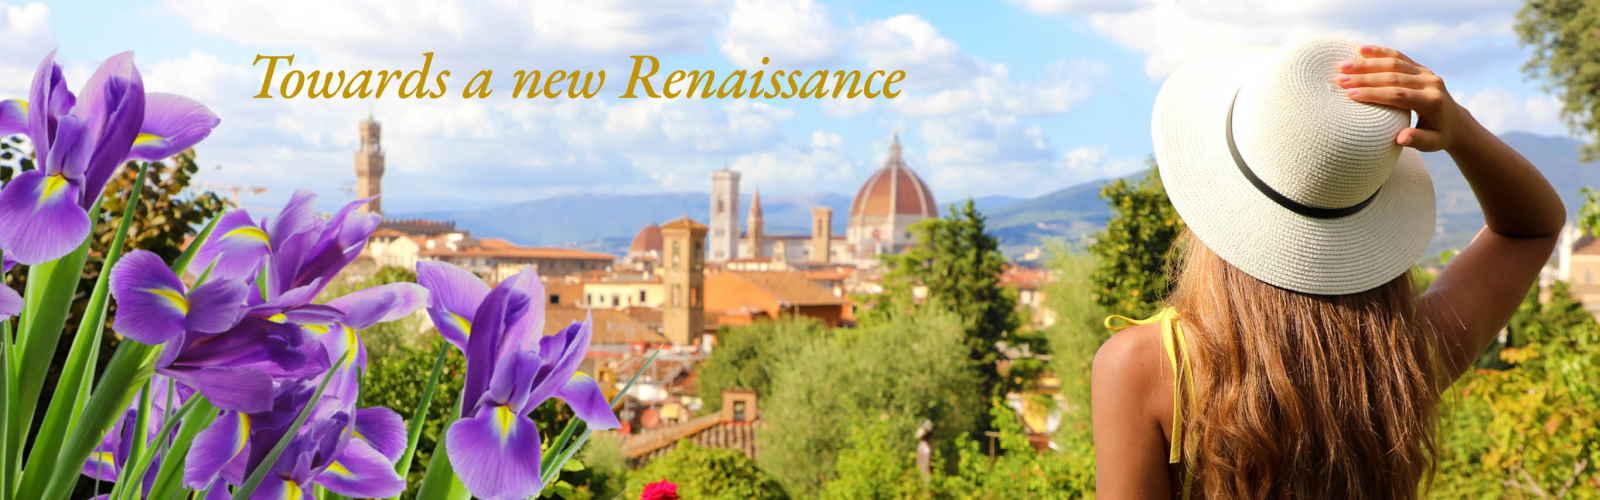 florence-new-renaissance